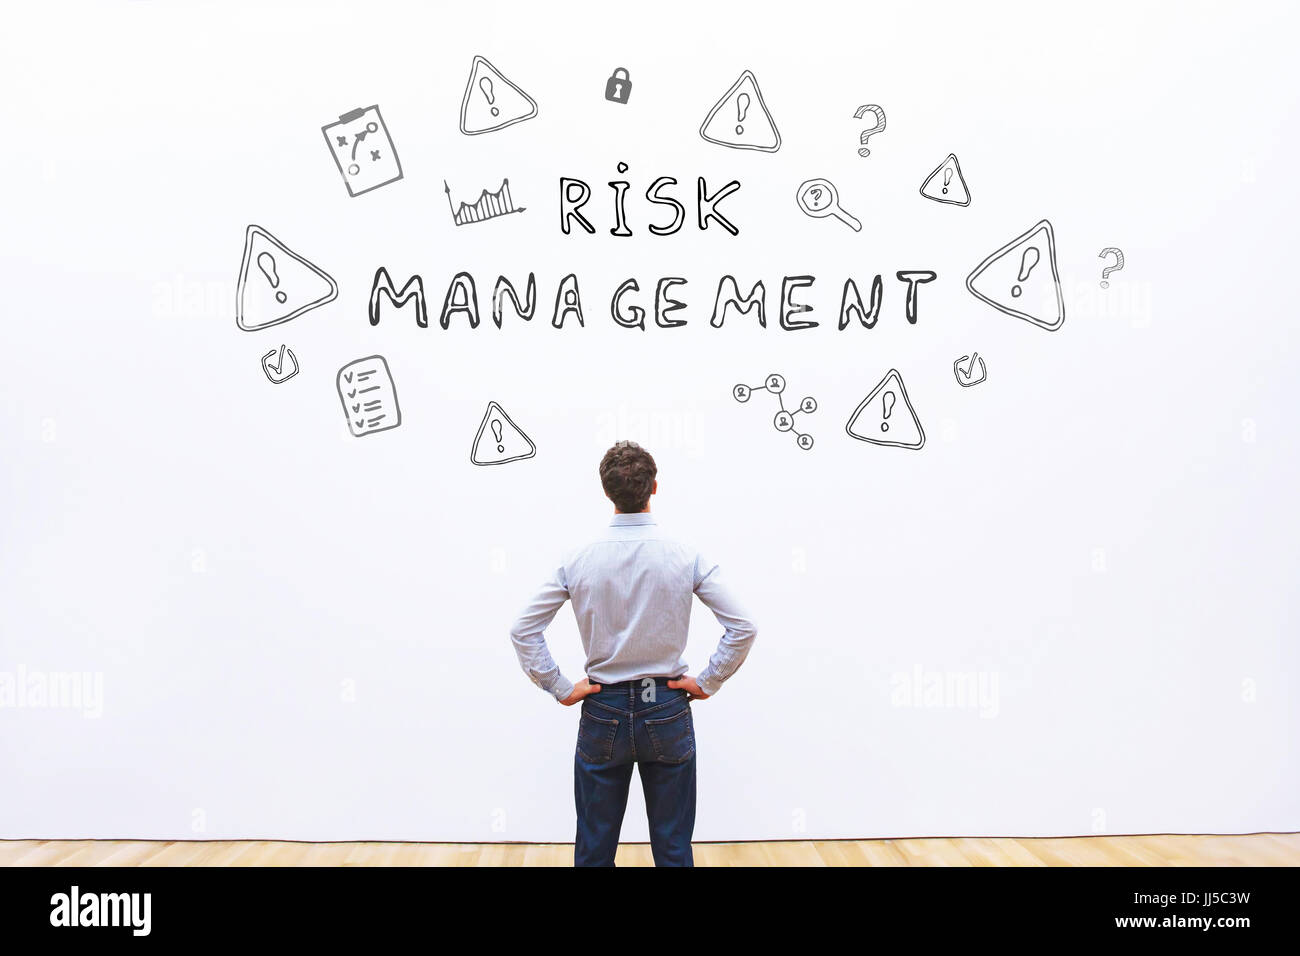 risk management concept - Stock Image